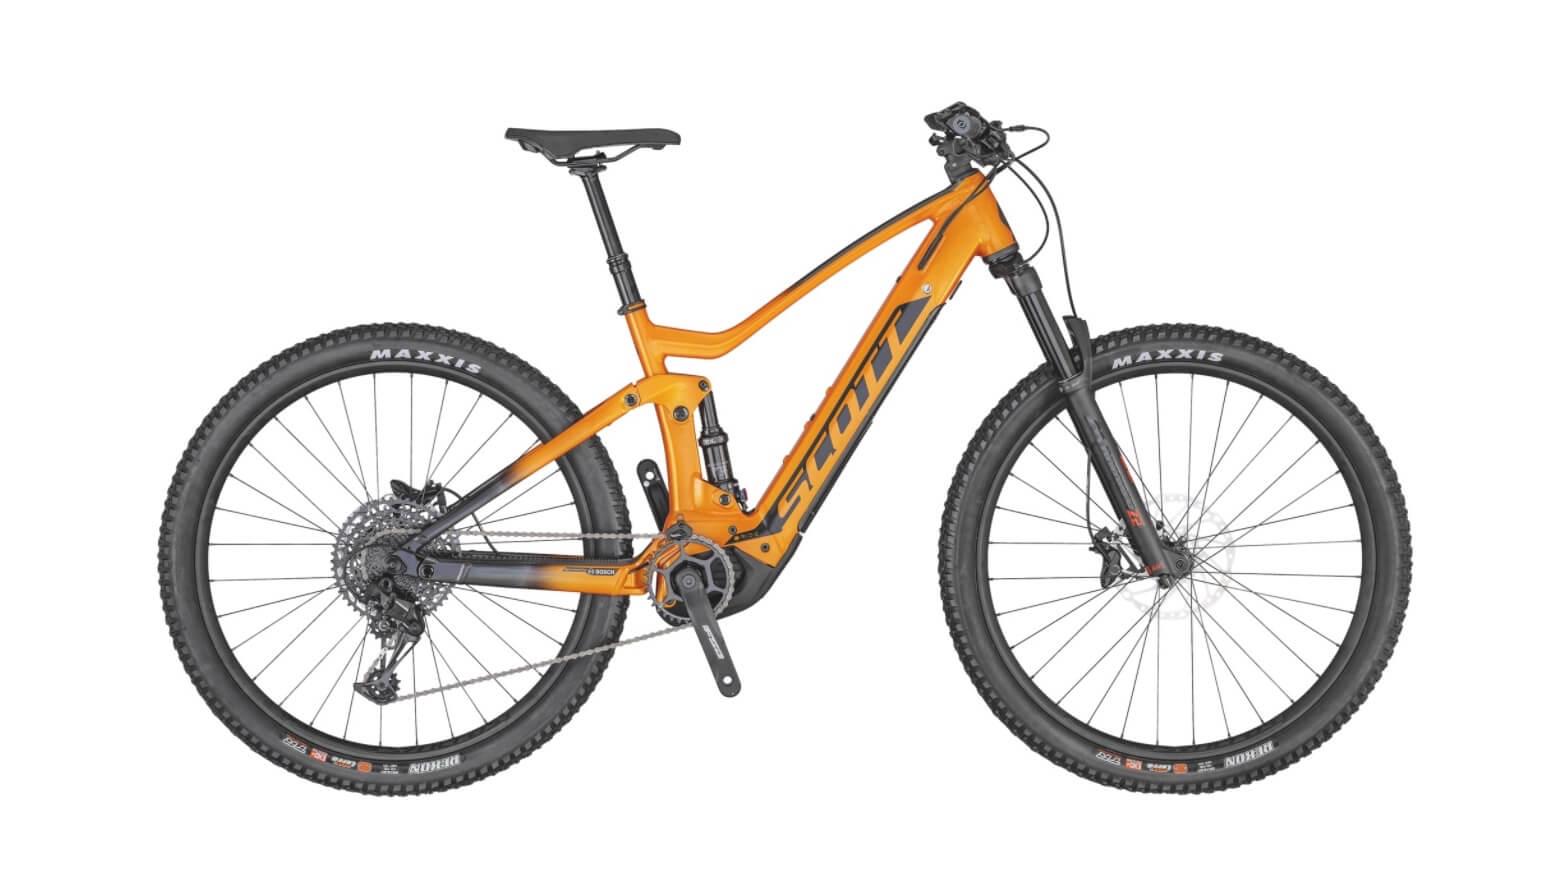 Scott fully elektrische mountainbike